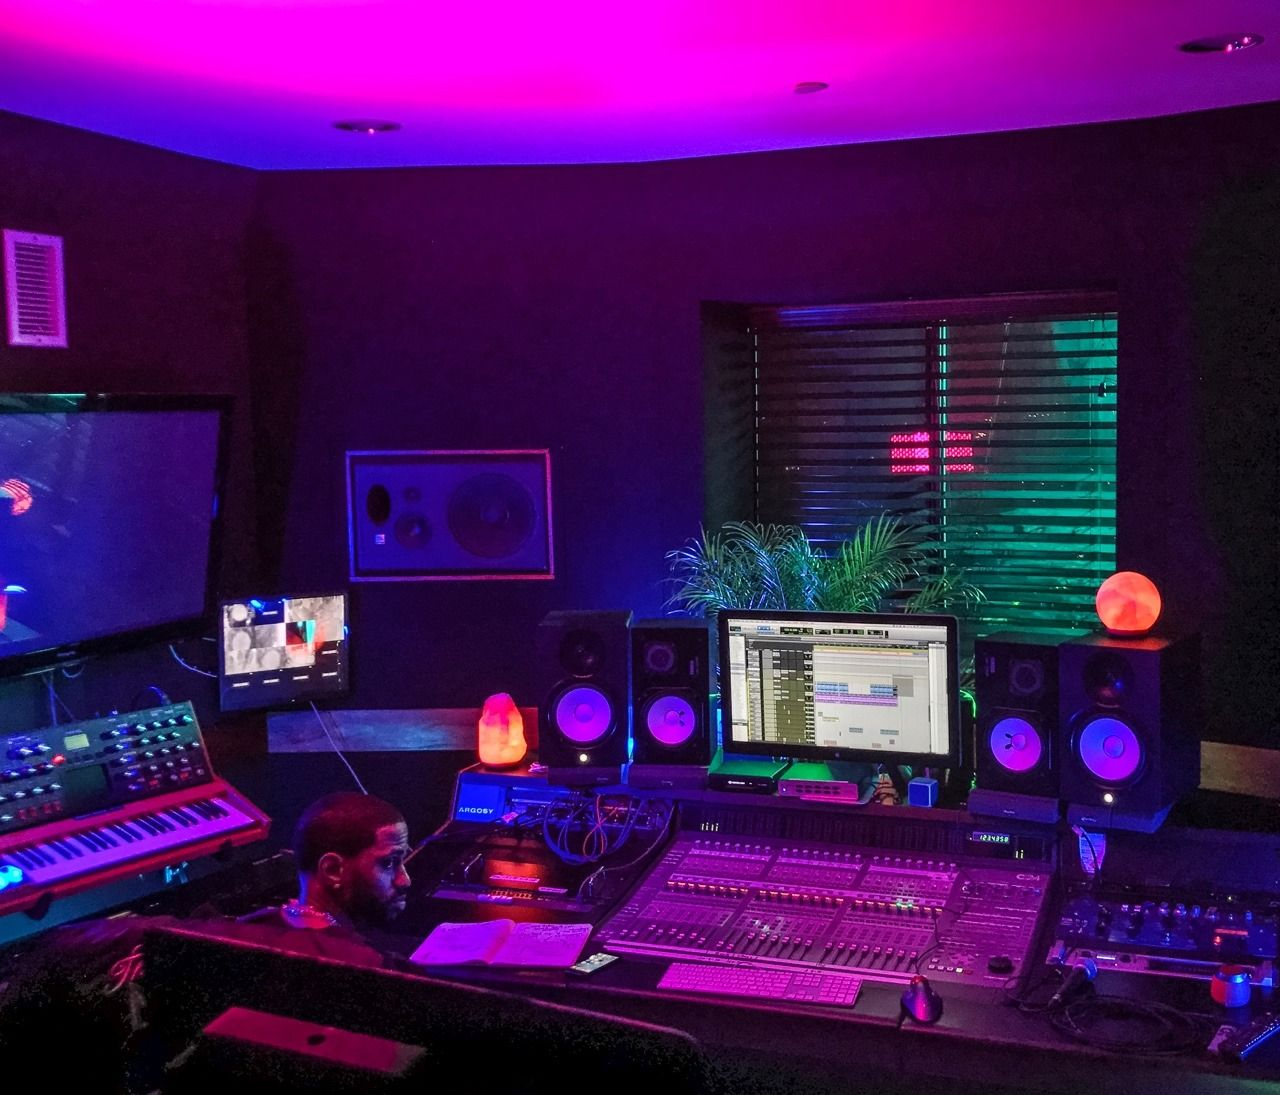 Aesthetic Room Decor Ideas Led Lights